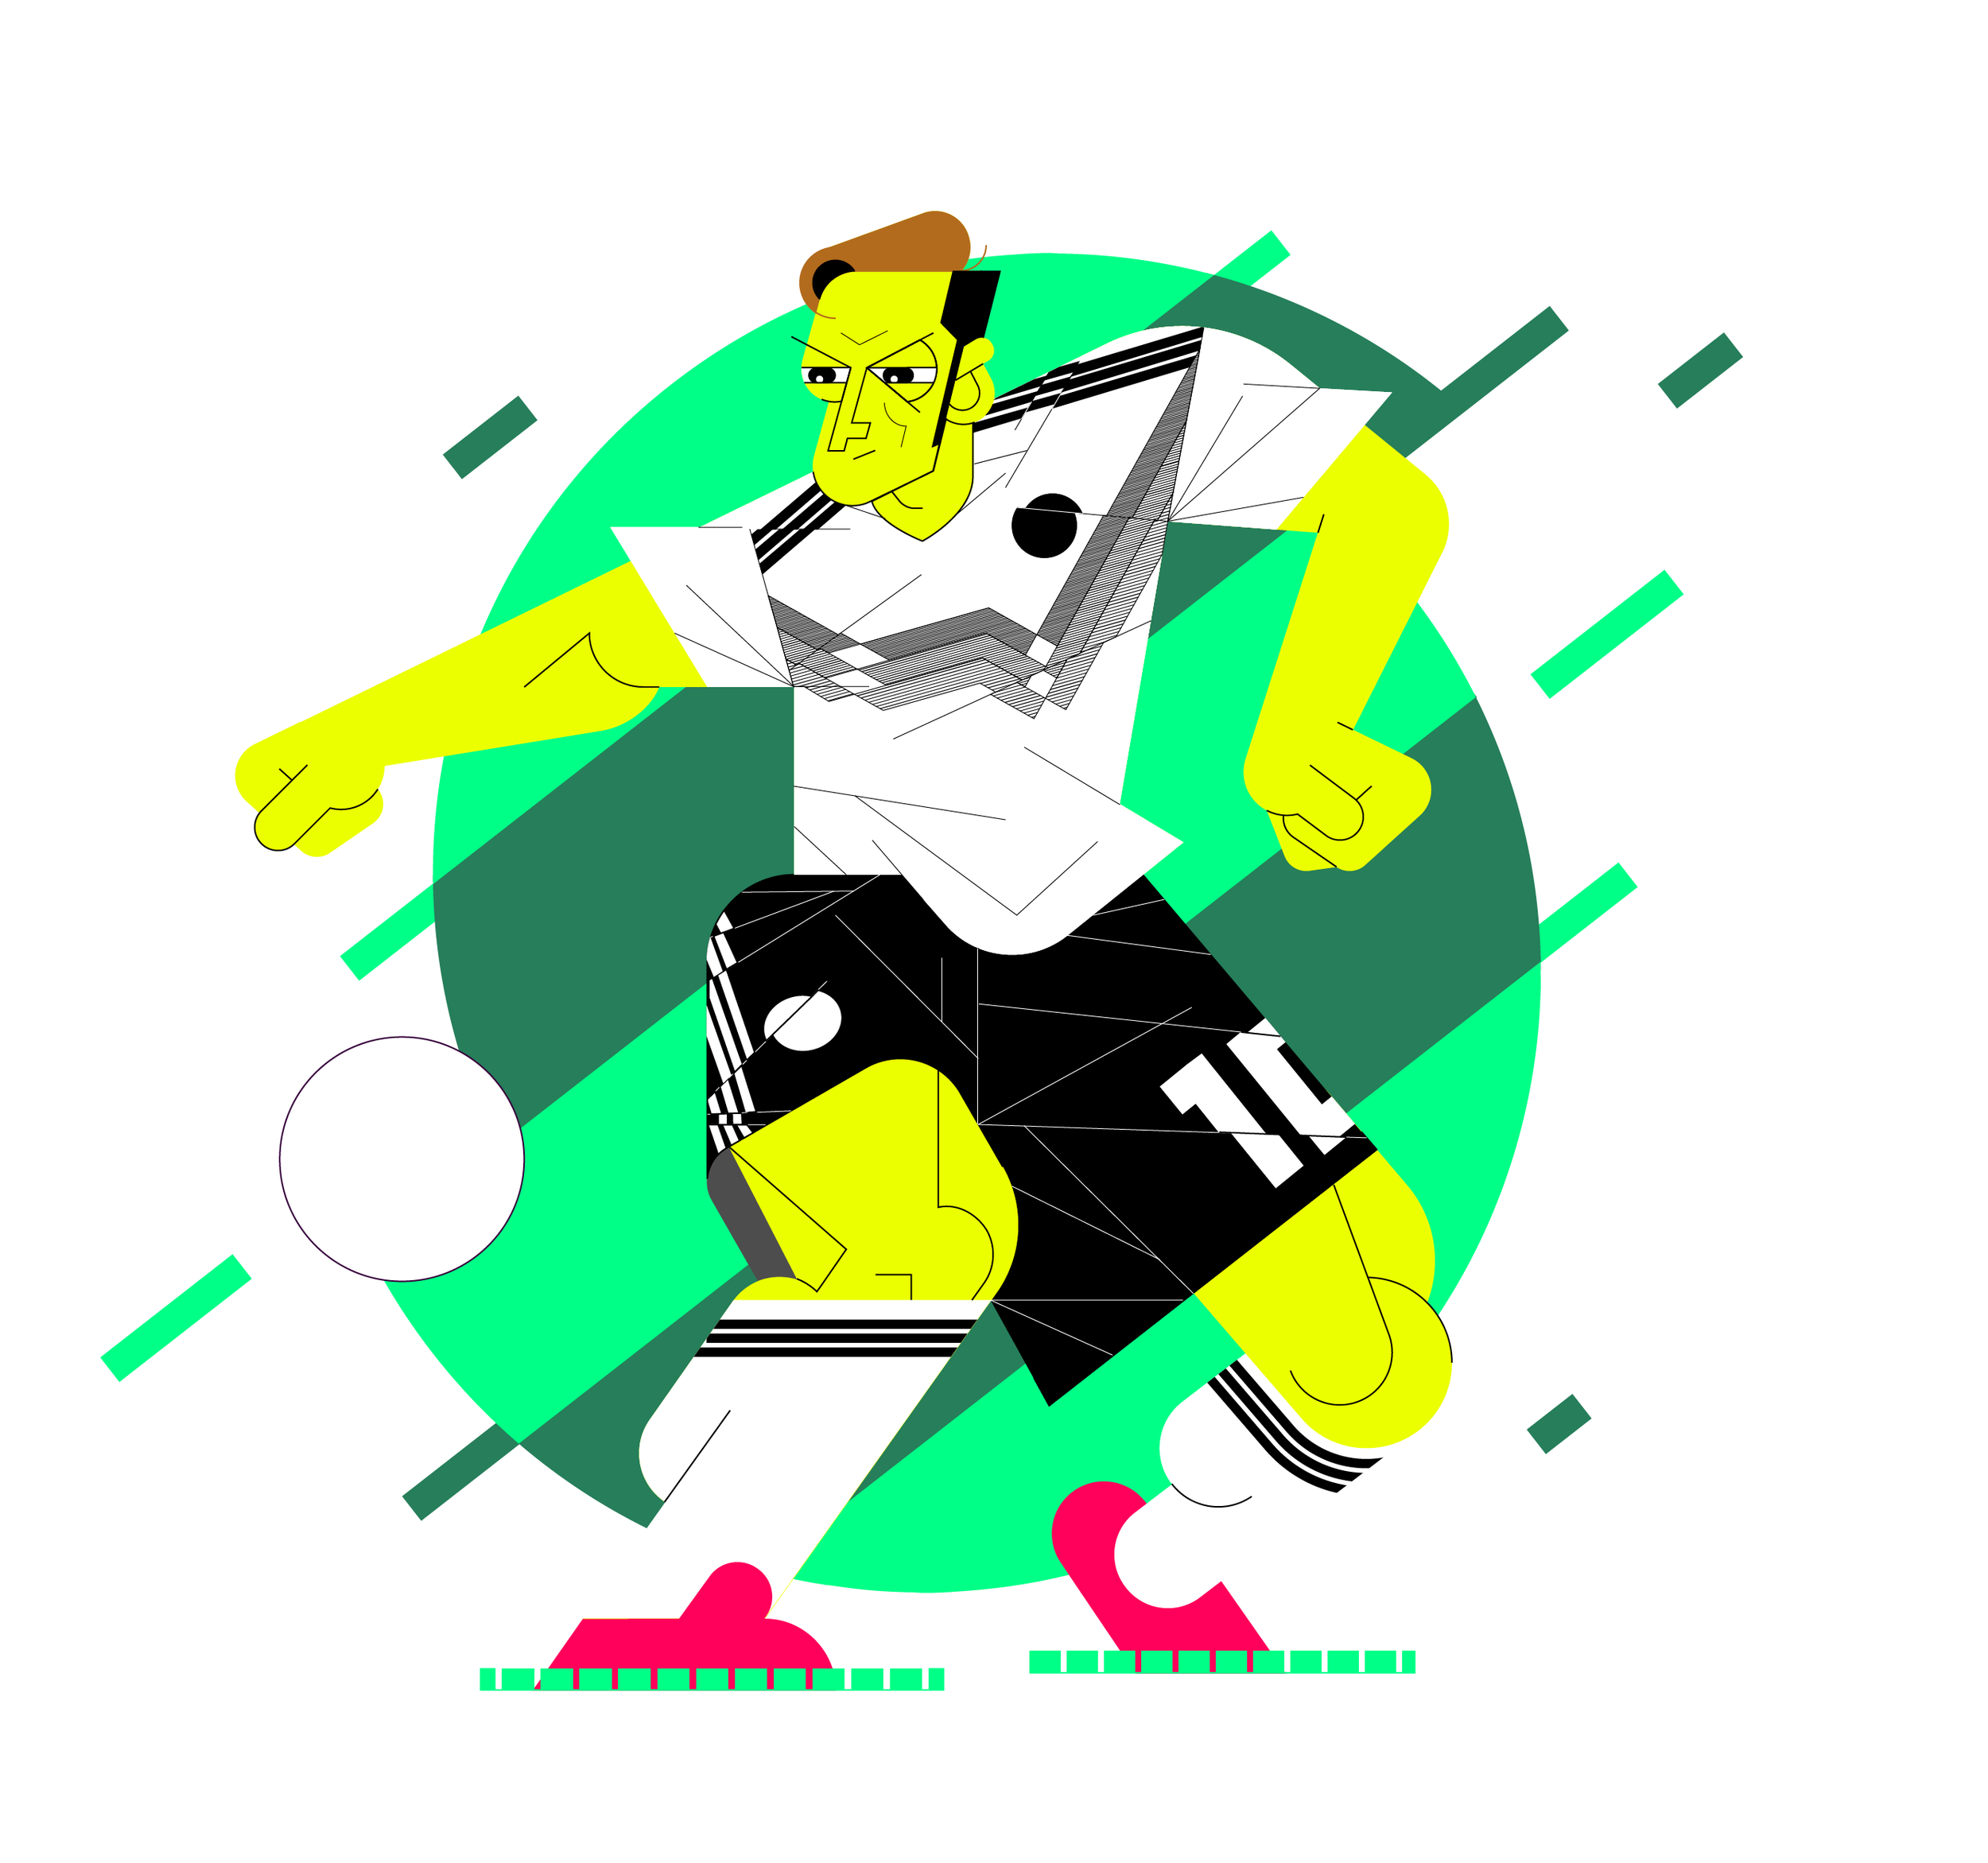 Football Players_Mesut Özil studies_Germany final_2.png